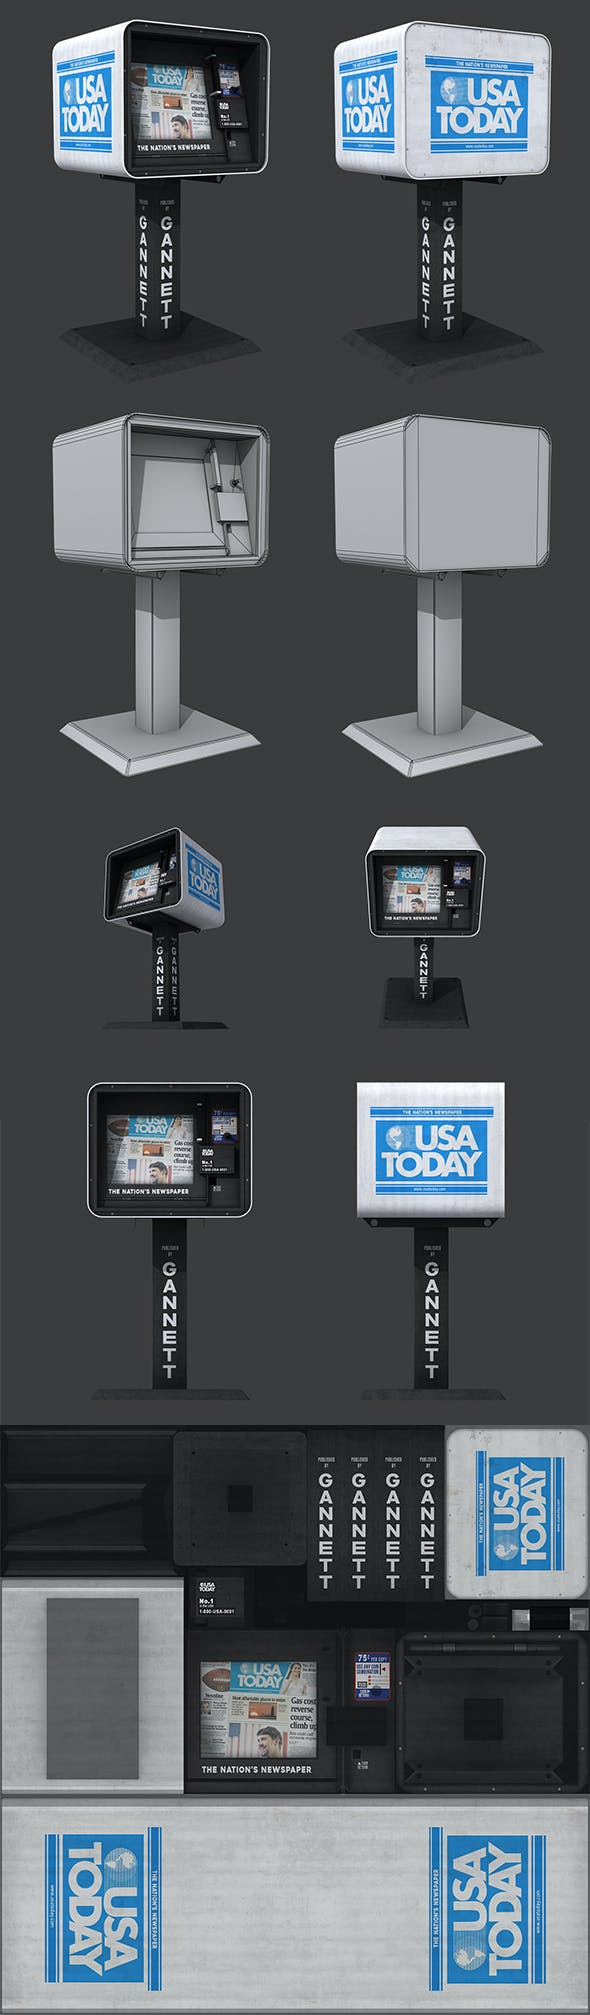 USA Today Newspaper Dispenser - 3DOcean Item for Sale